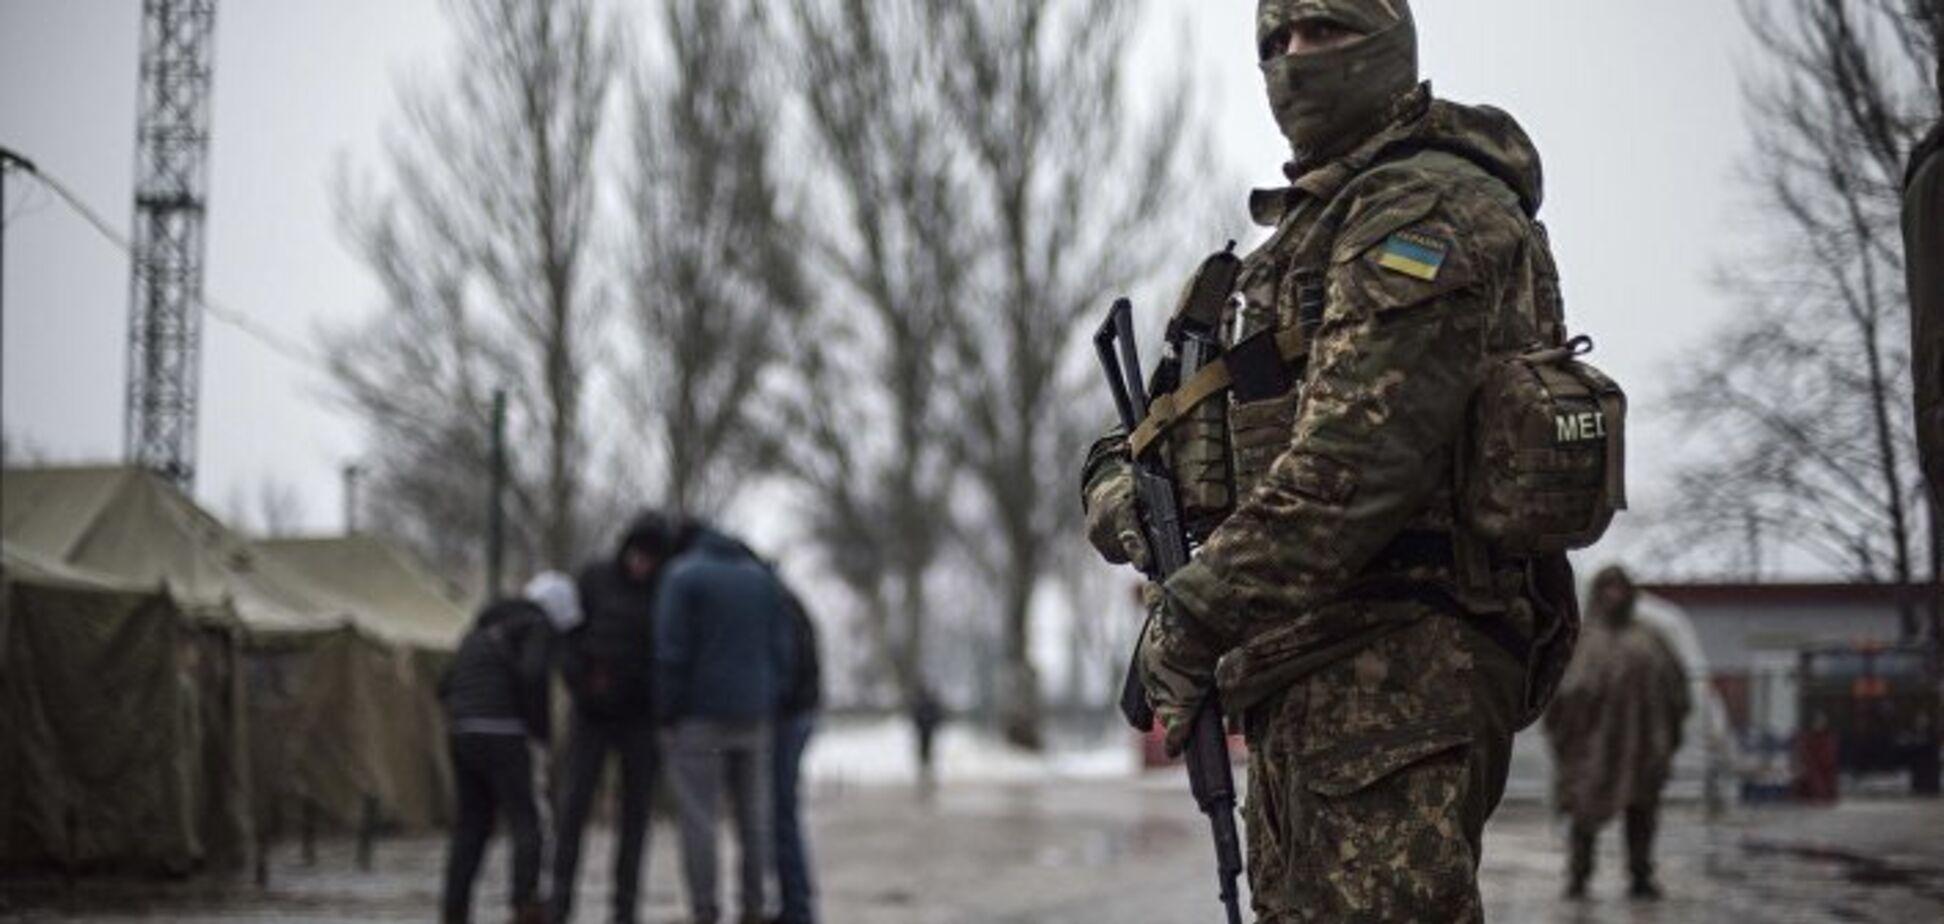 ВСУ устроили 'Л/ДНР' ад на Донбассе за убитого побратима